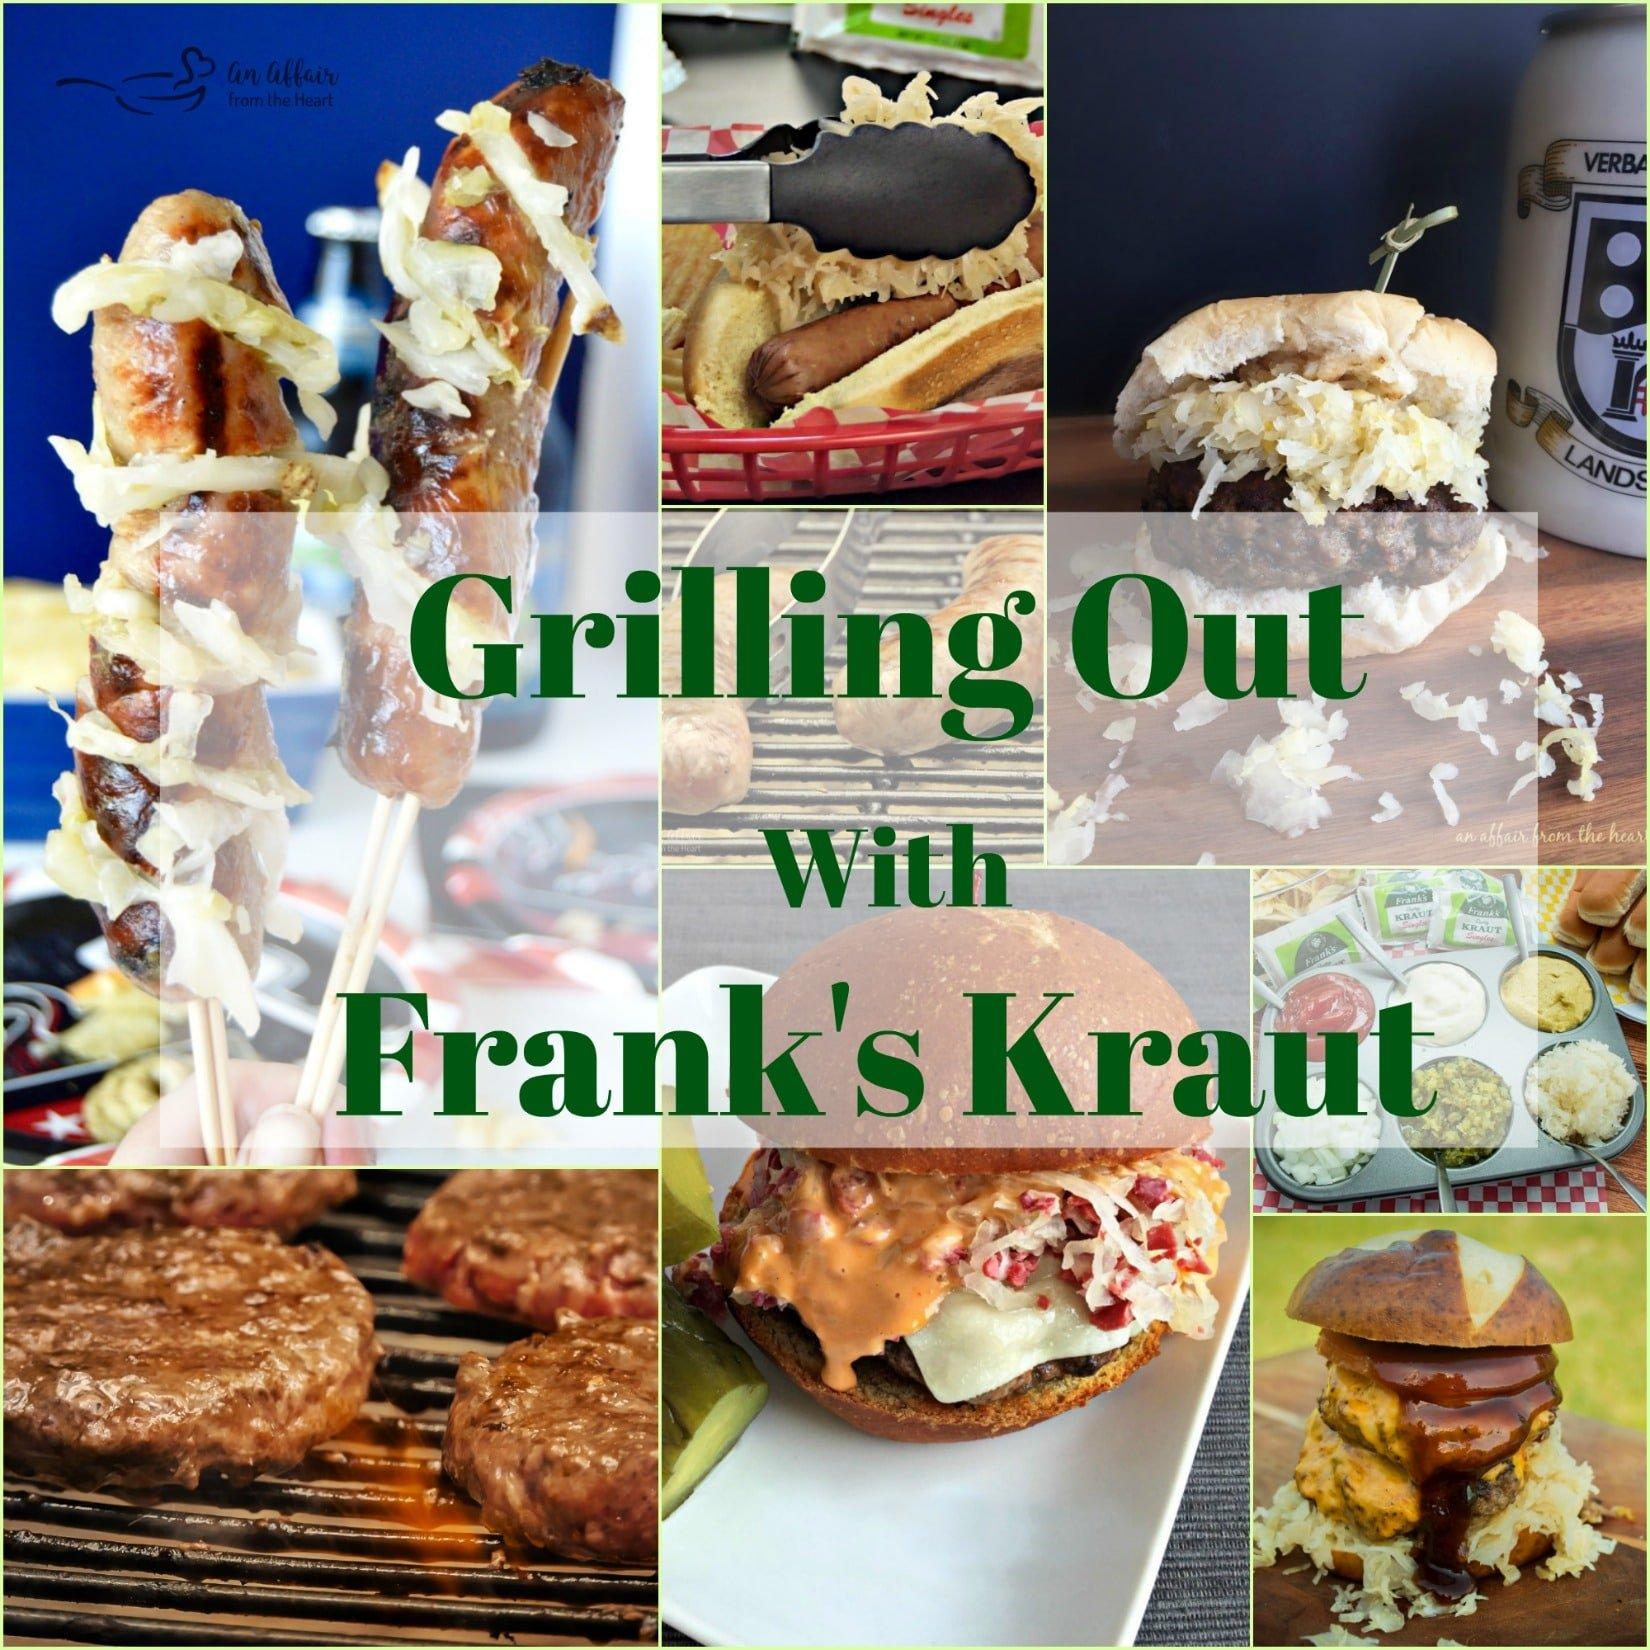 #GrillOutWithFranksKraut